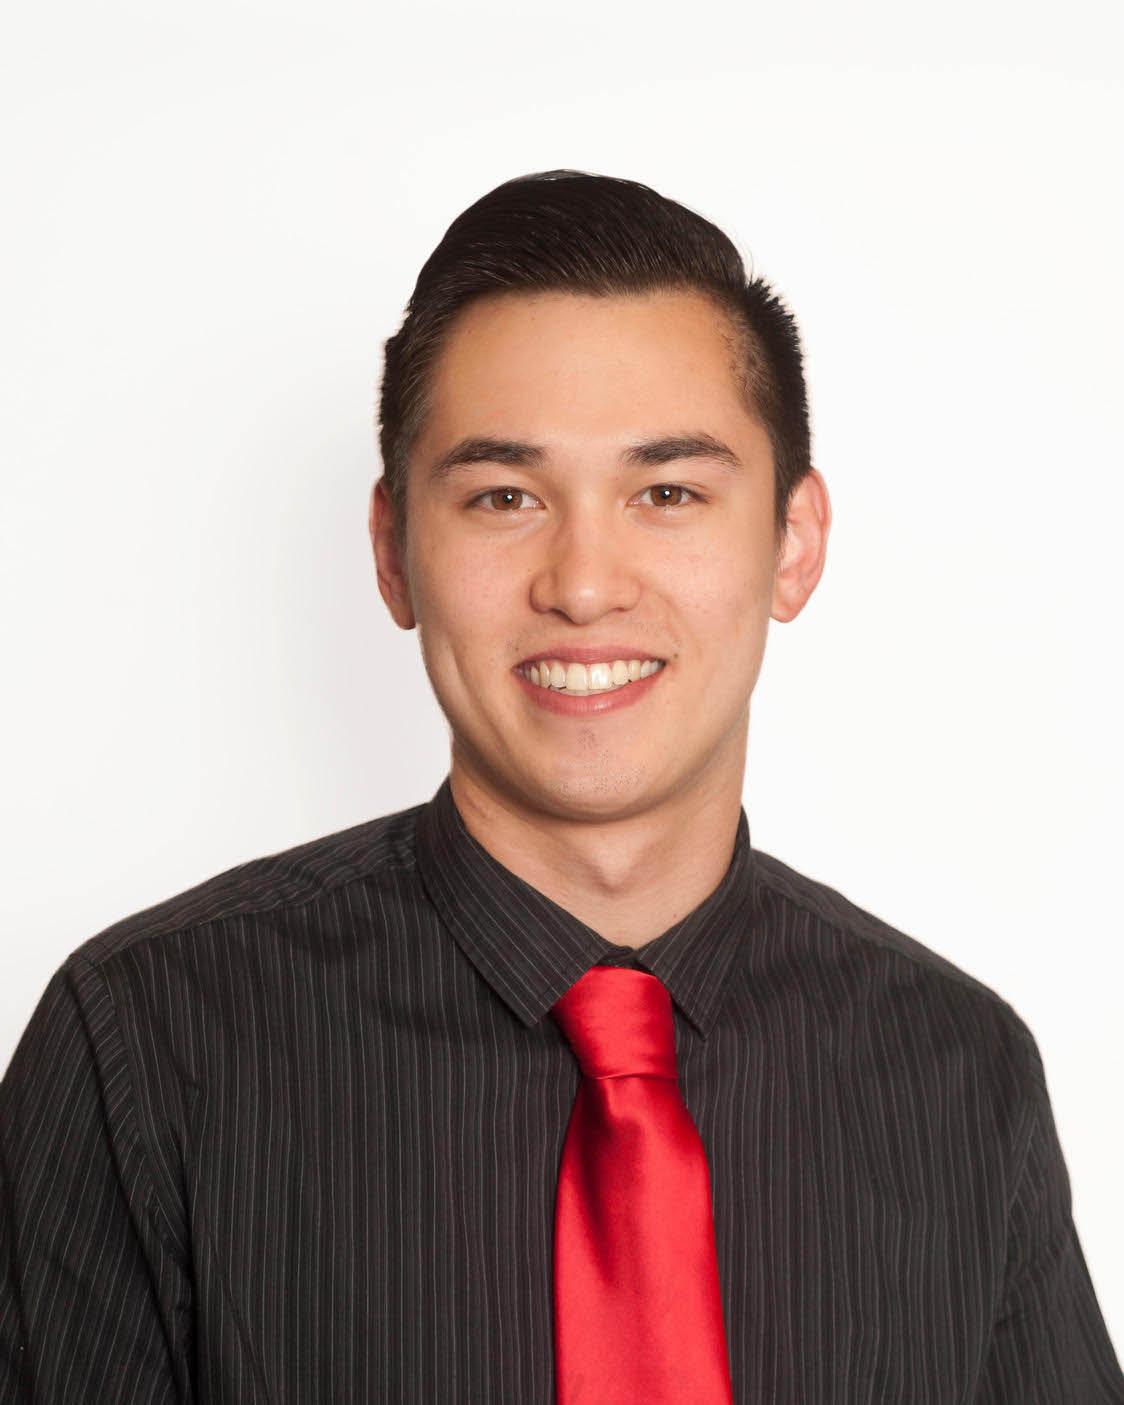 Zach Fox - your Seattle and Eastside realtor - Keller Williams Realty - Seattle area realtors - Seattle realtor - real estate agent